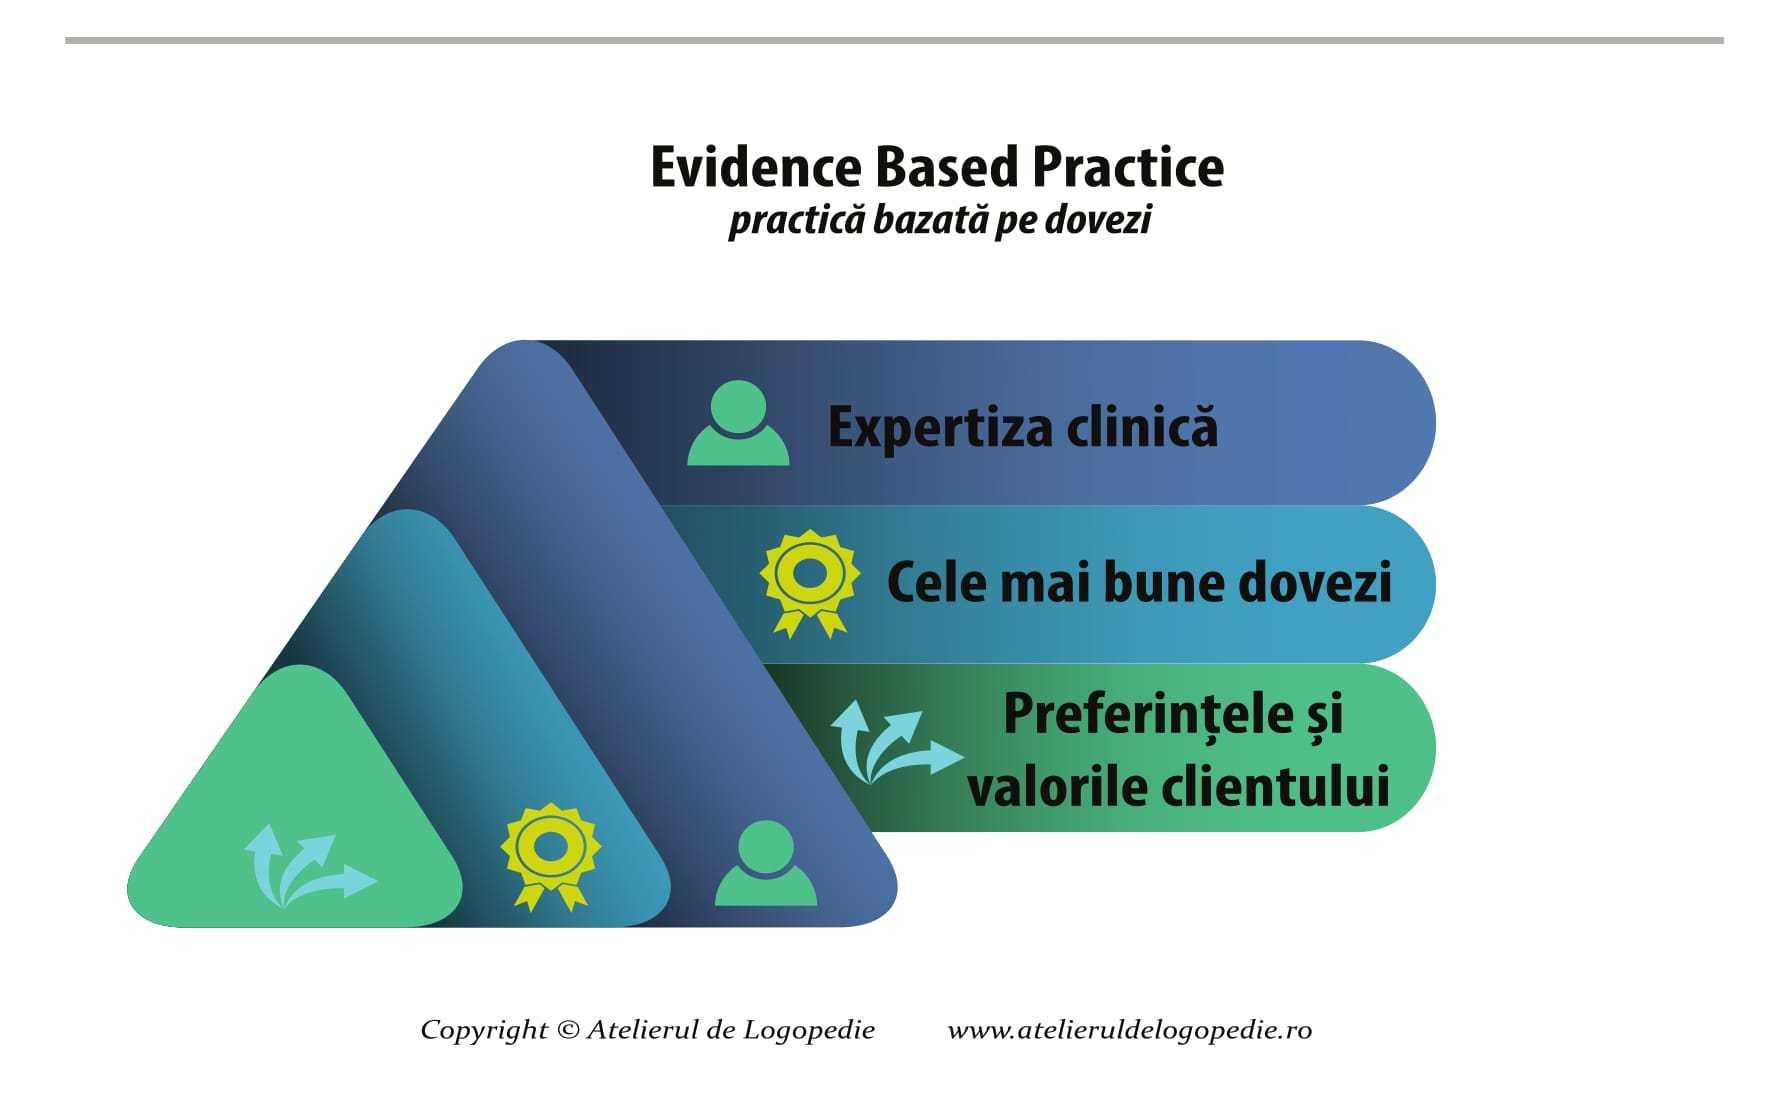 Necesitatea evidence based practice în logopedie